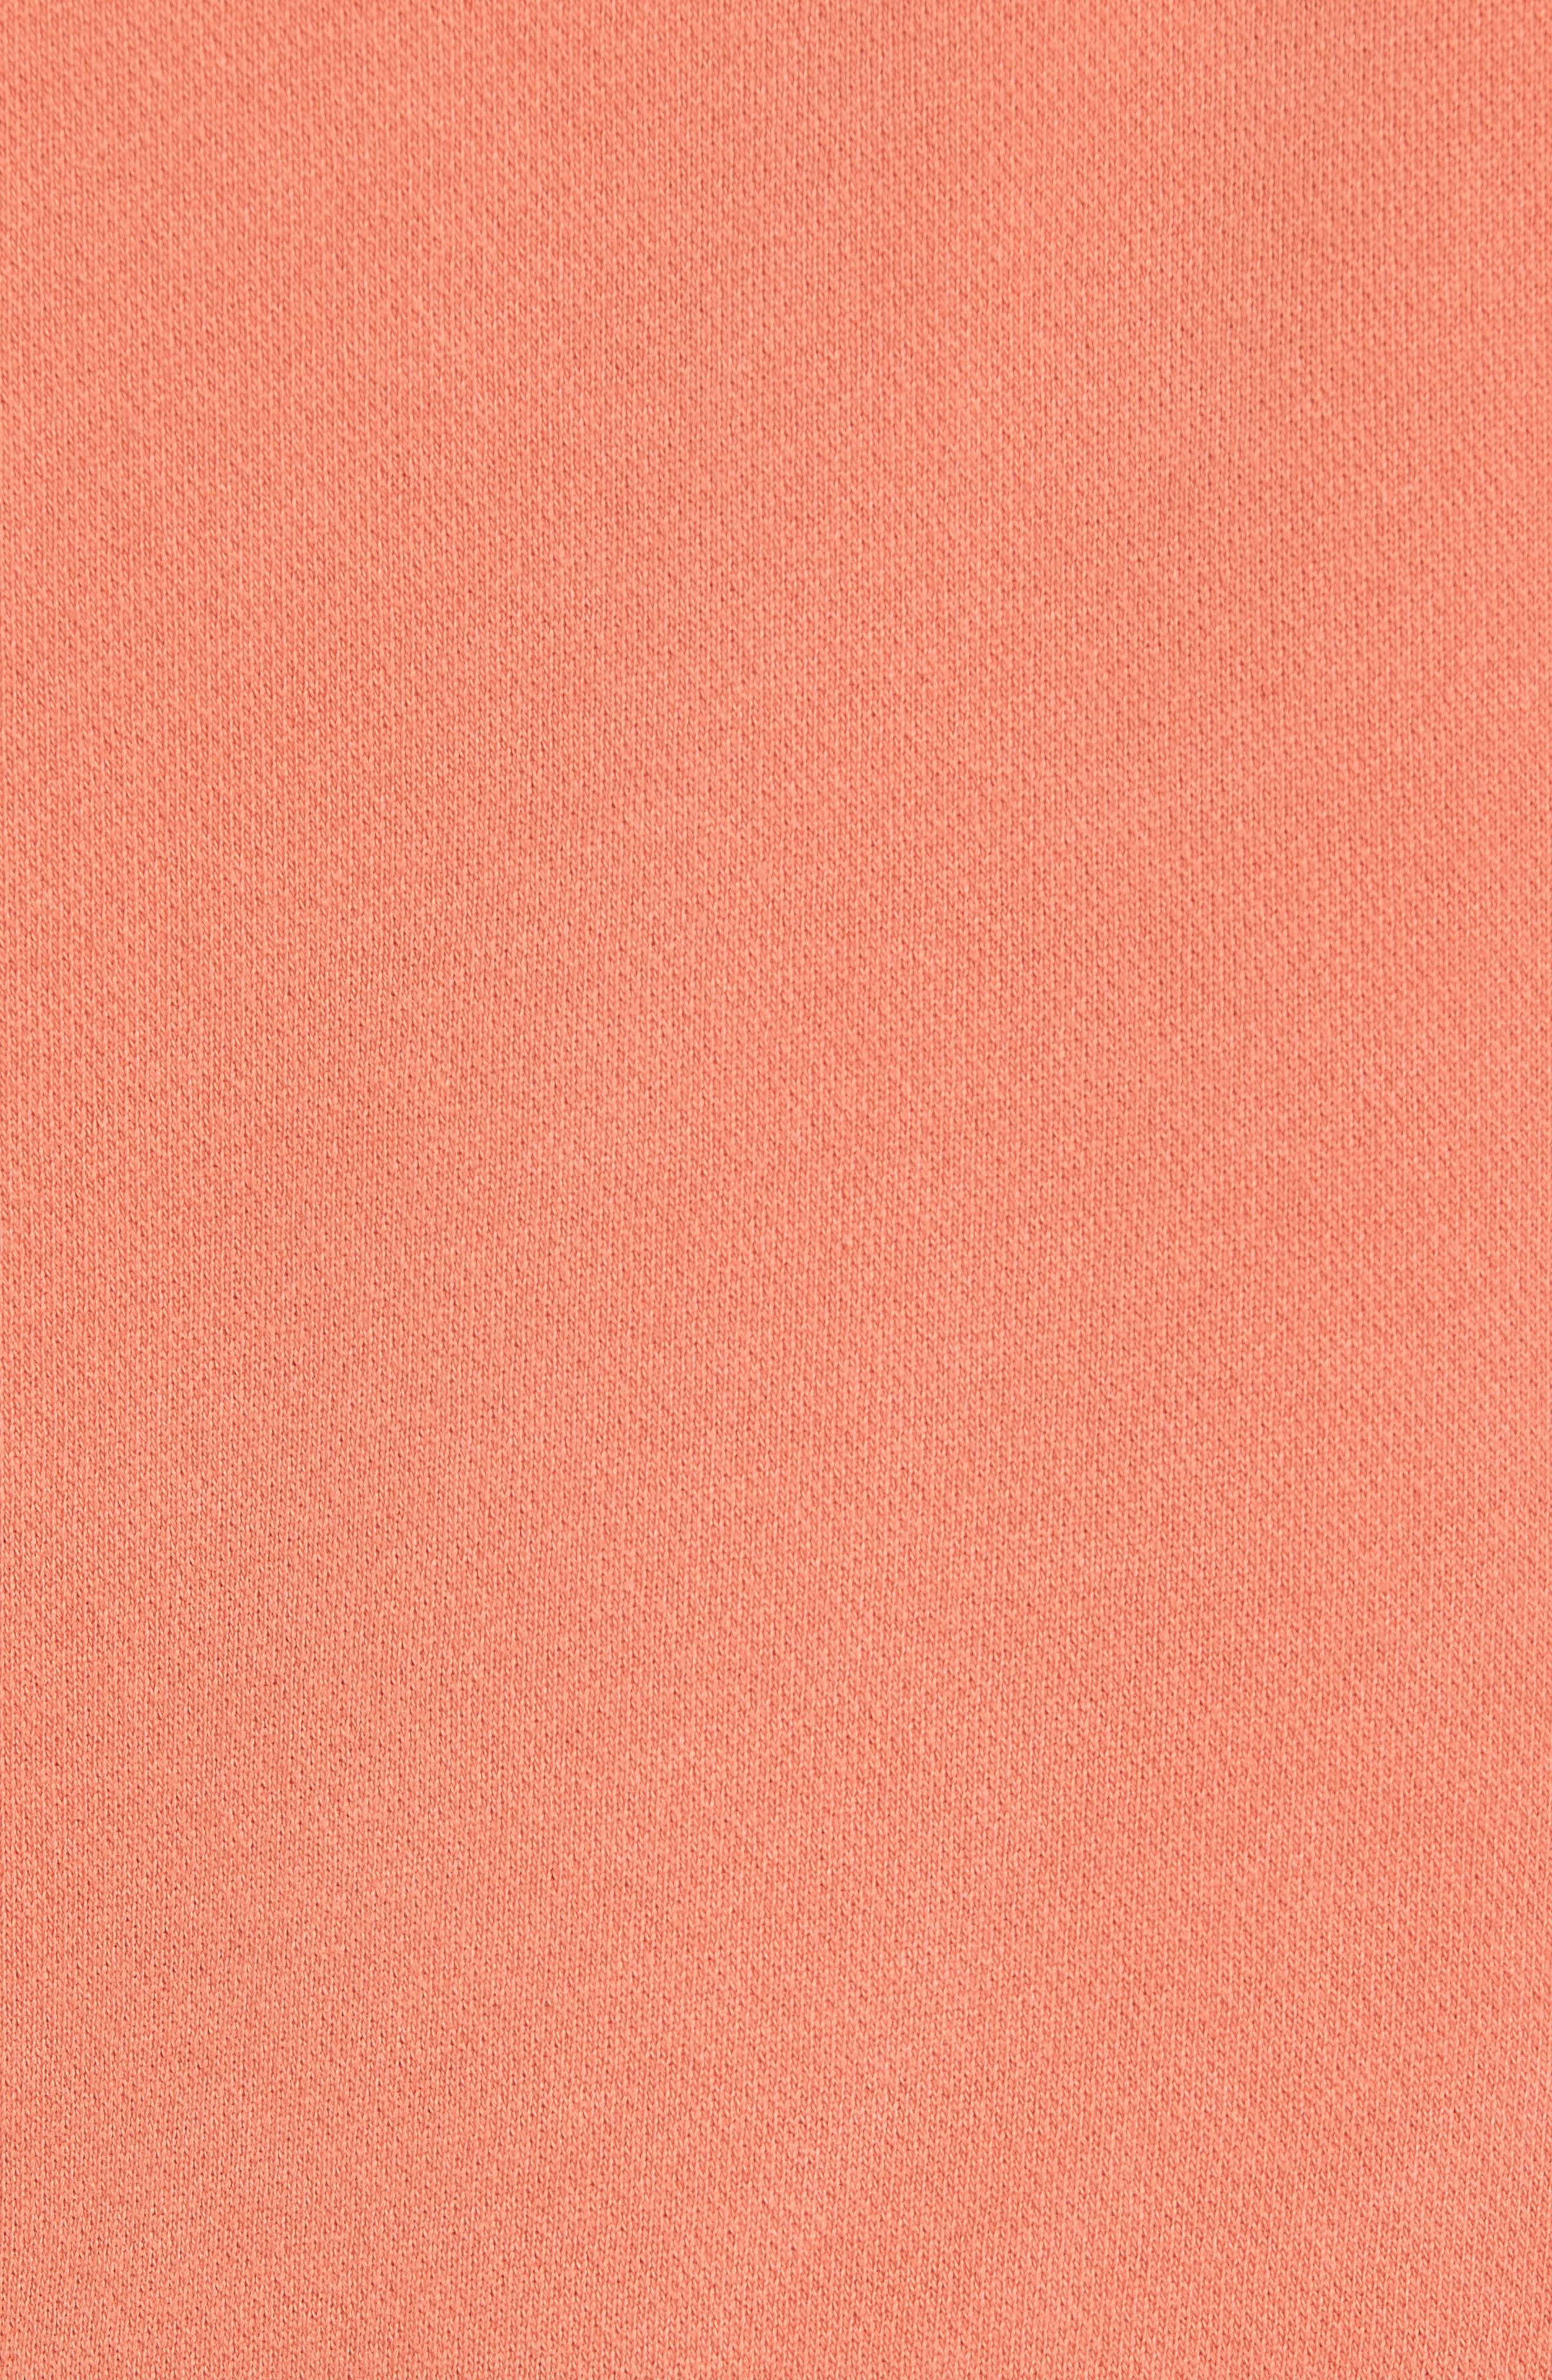 Alternate Image 5  - Levi's® Vintage Clothing Colorblocked Quarter Zip Pullover